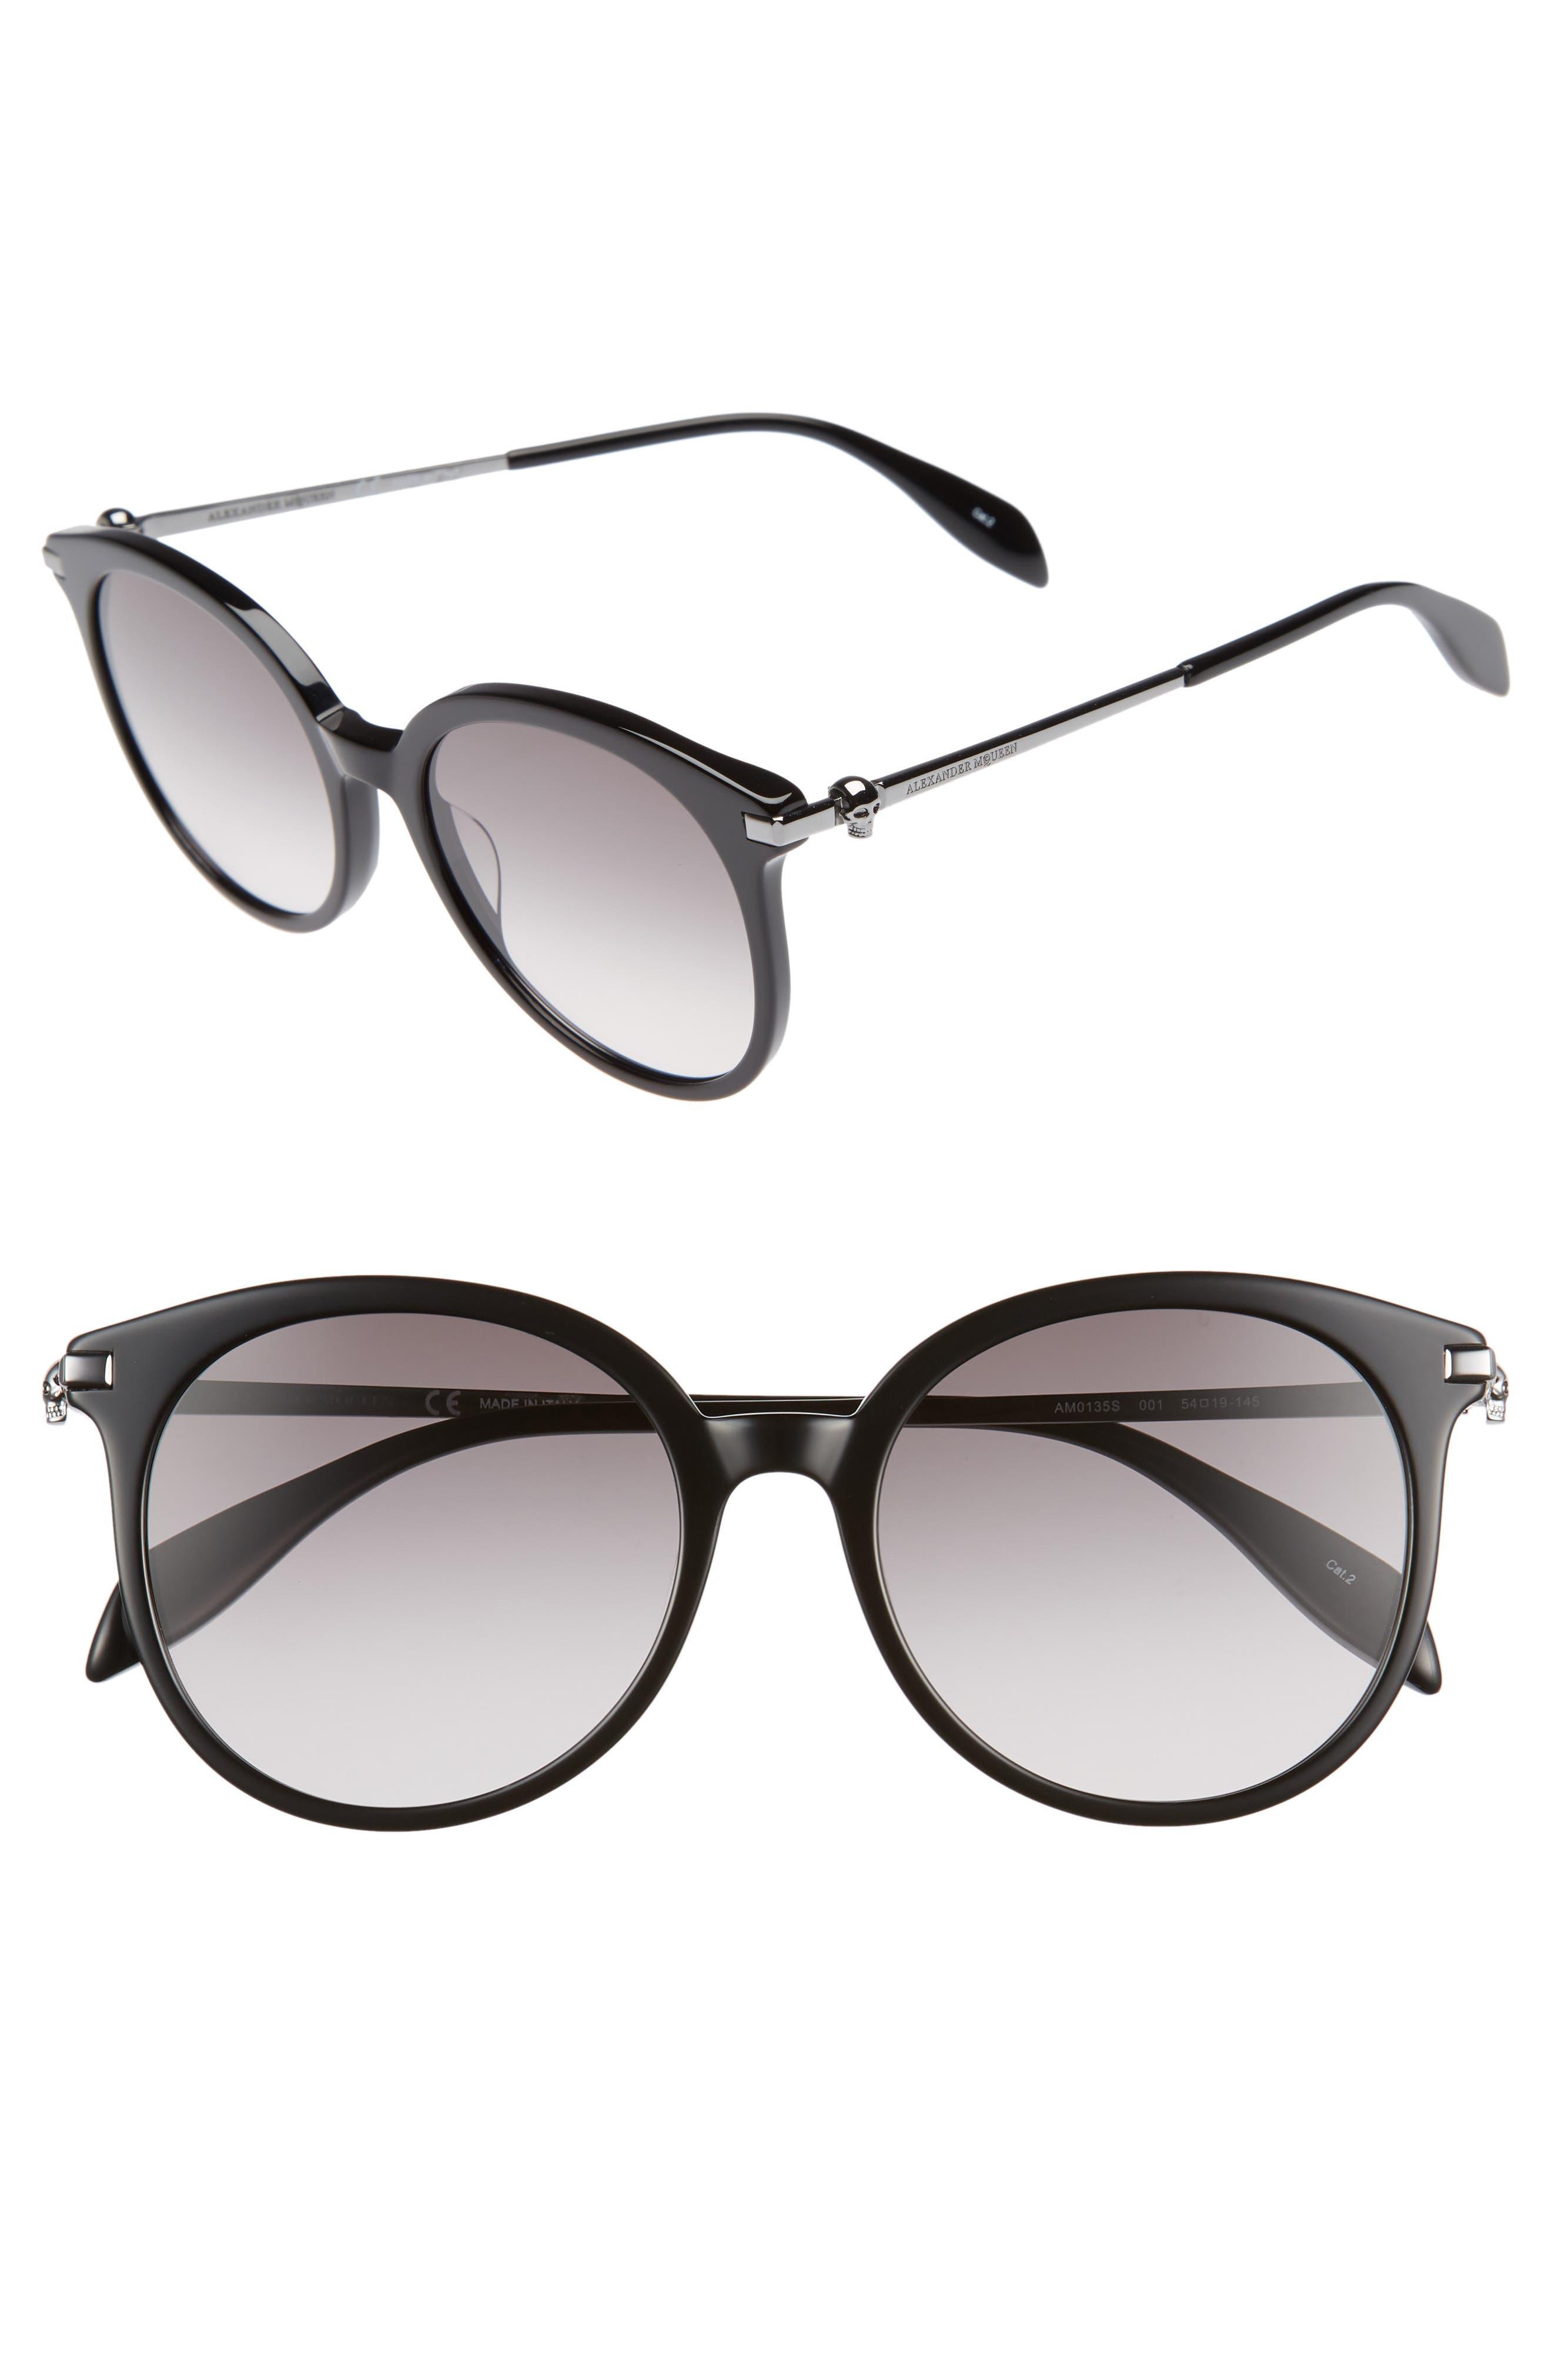 Alexander McQueen 54mm Gradient Lens Round Sunglasses